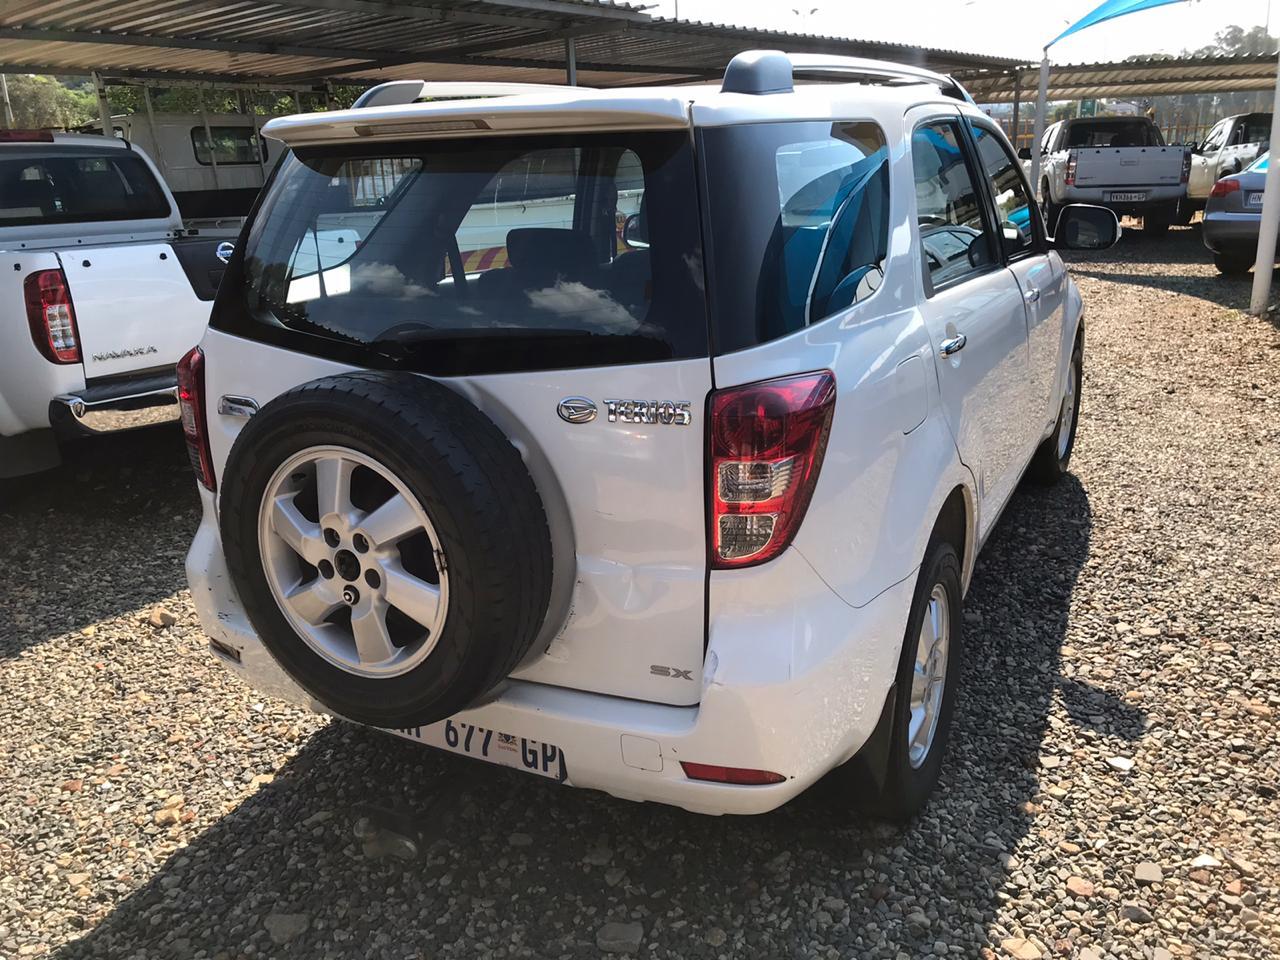 2010 Daihatsu Terios Long 1.5 4x4 7 seater